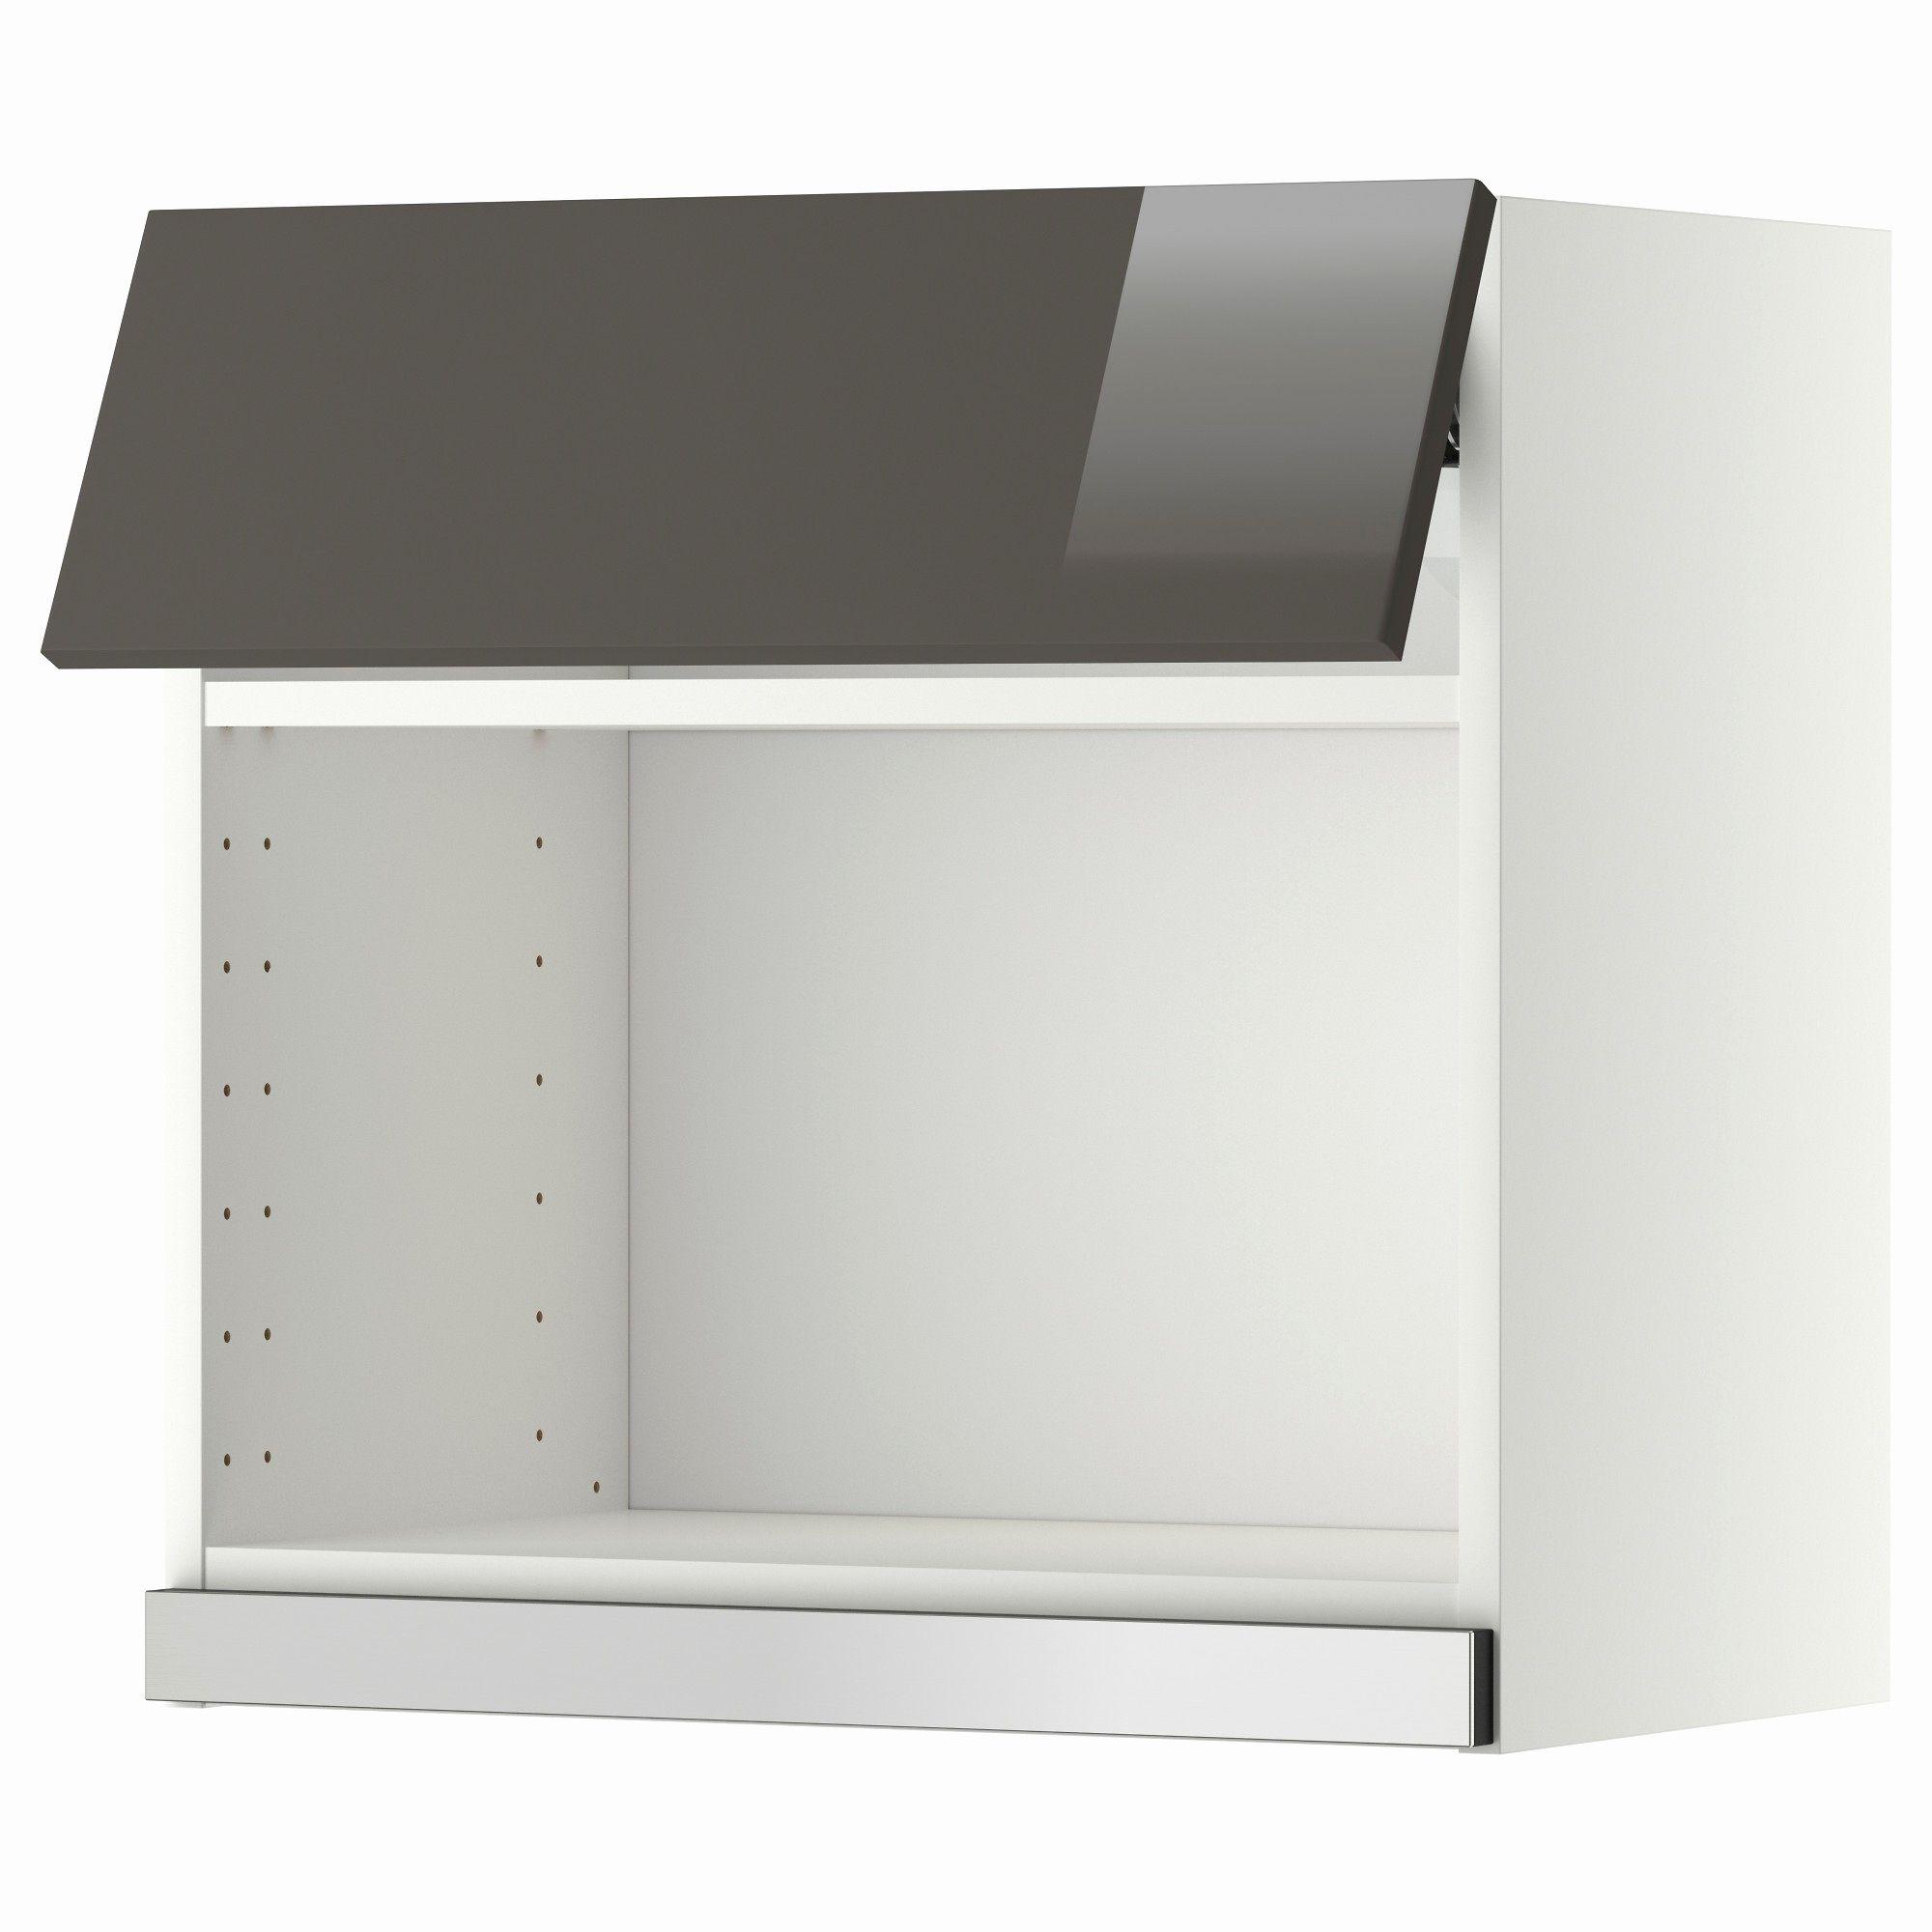 Meuble Micro Onde Ikea 77 meuble micro onde ikea check more at https://leonstafford